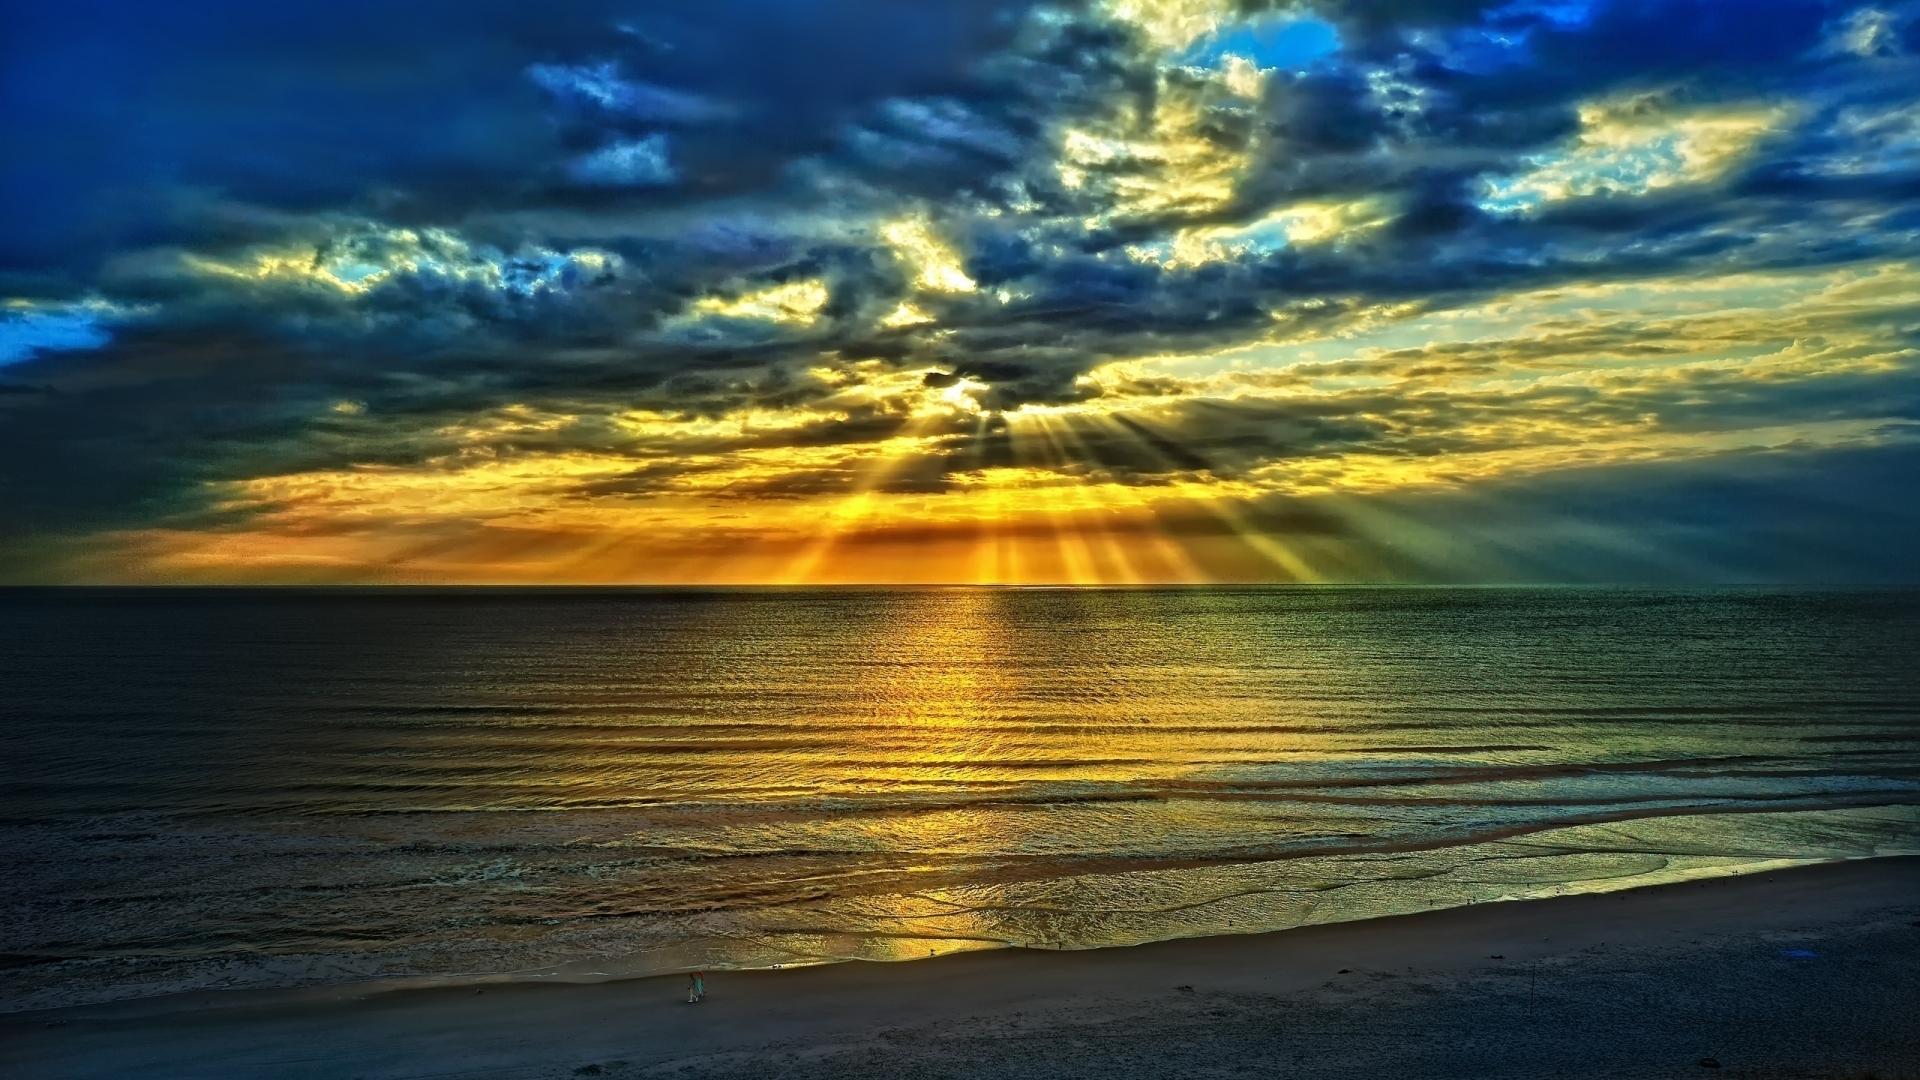 sunset background - wallpaper, high definition, high quality, widescreen